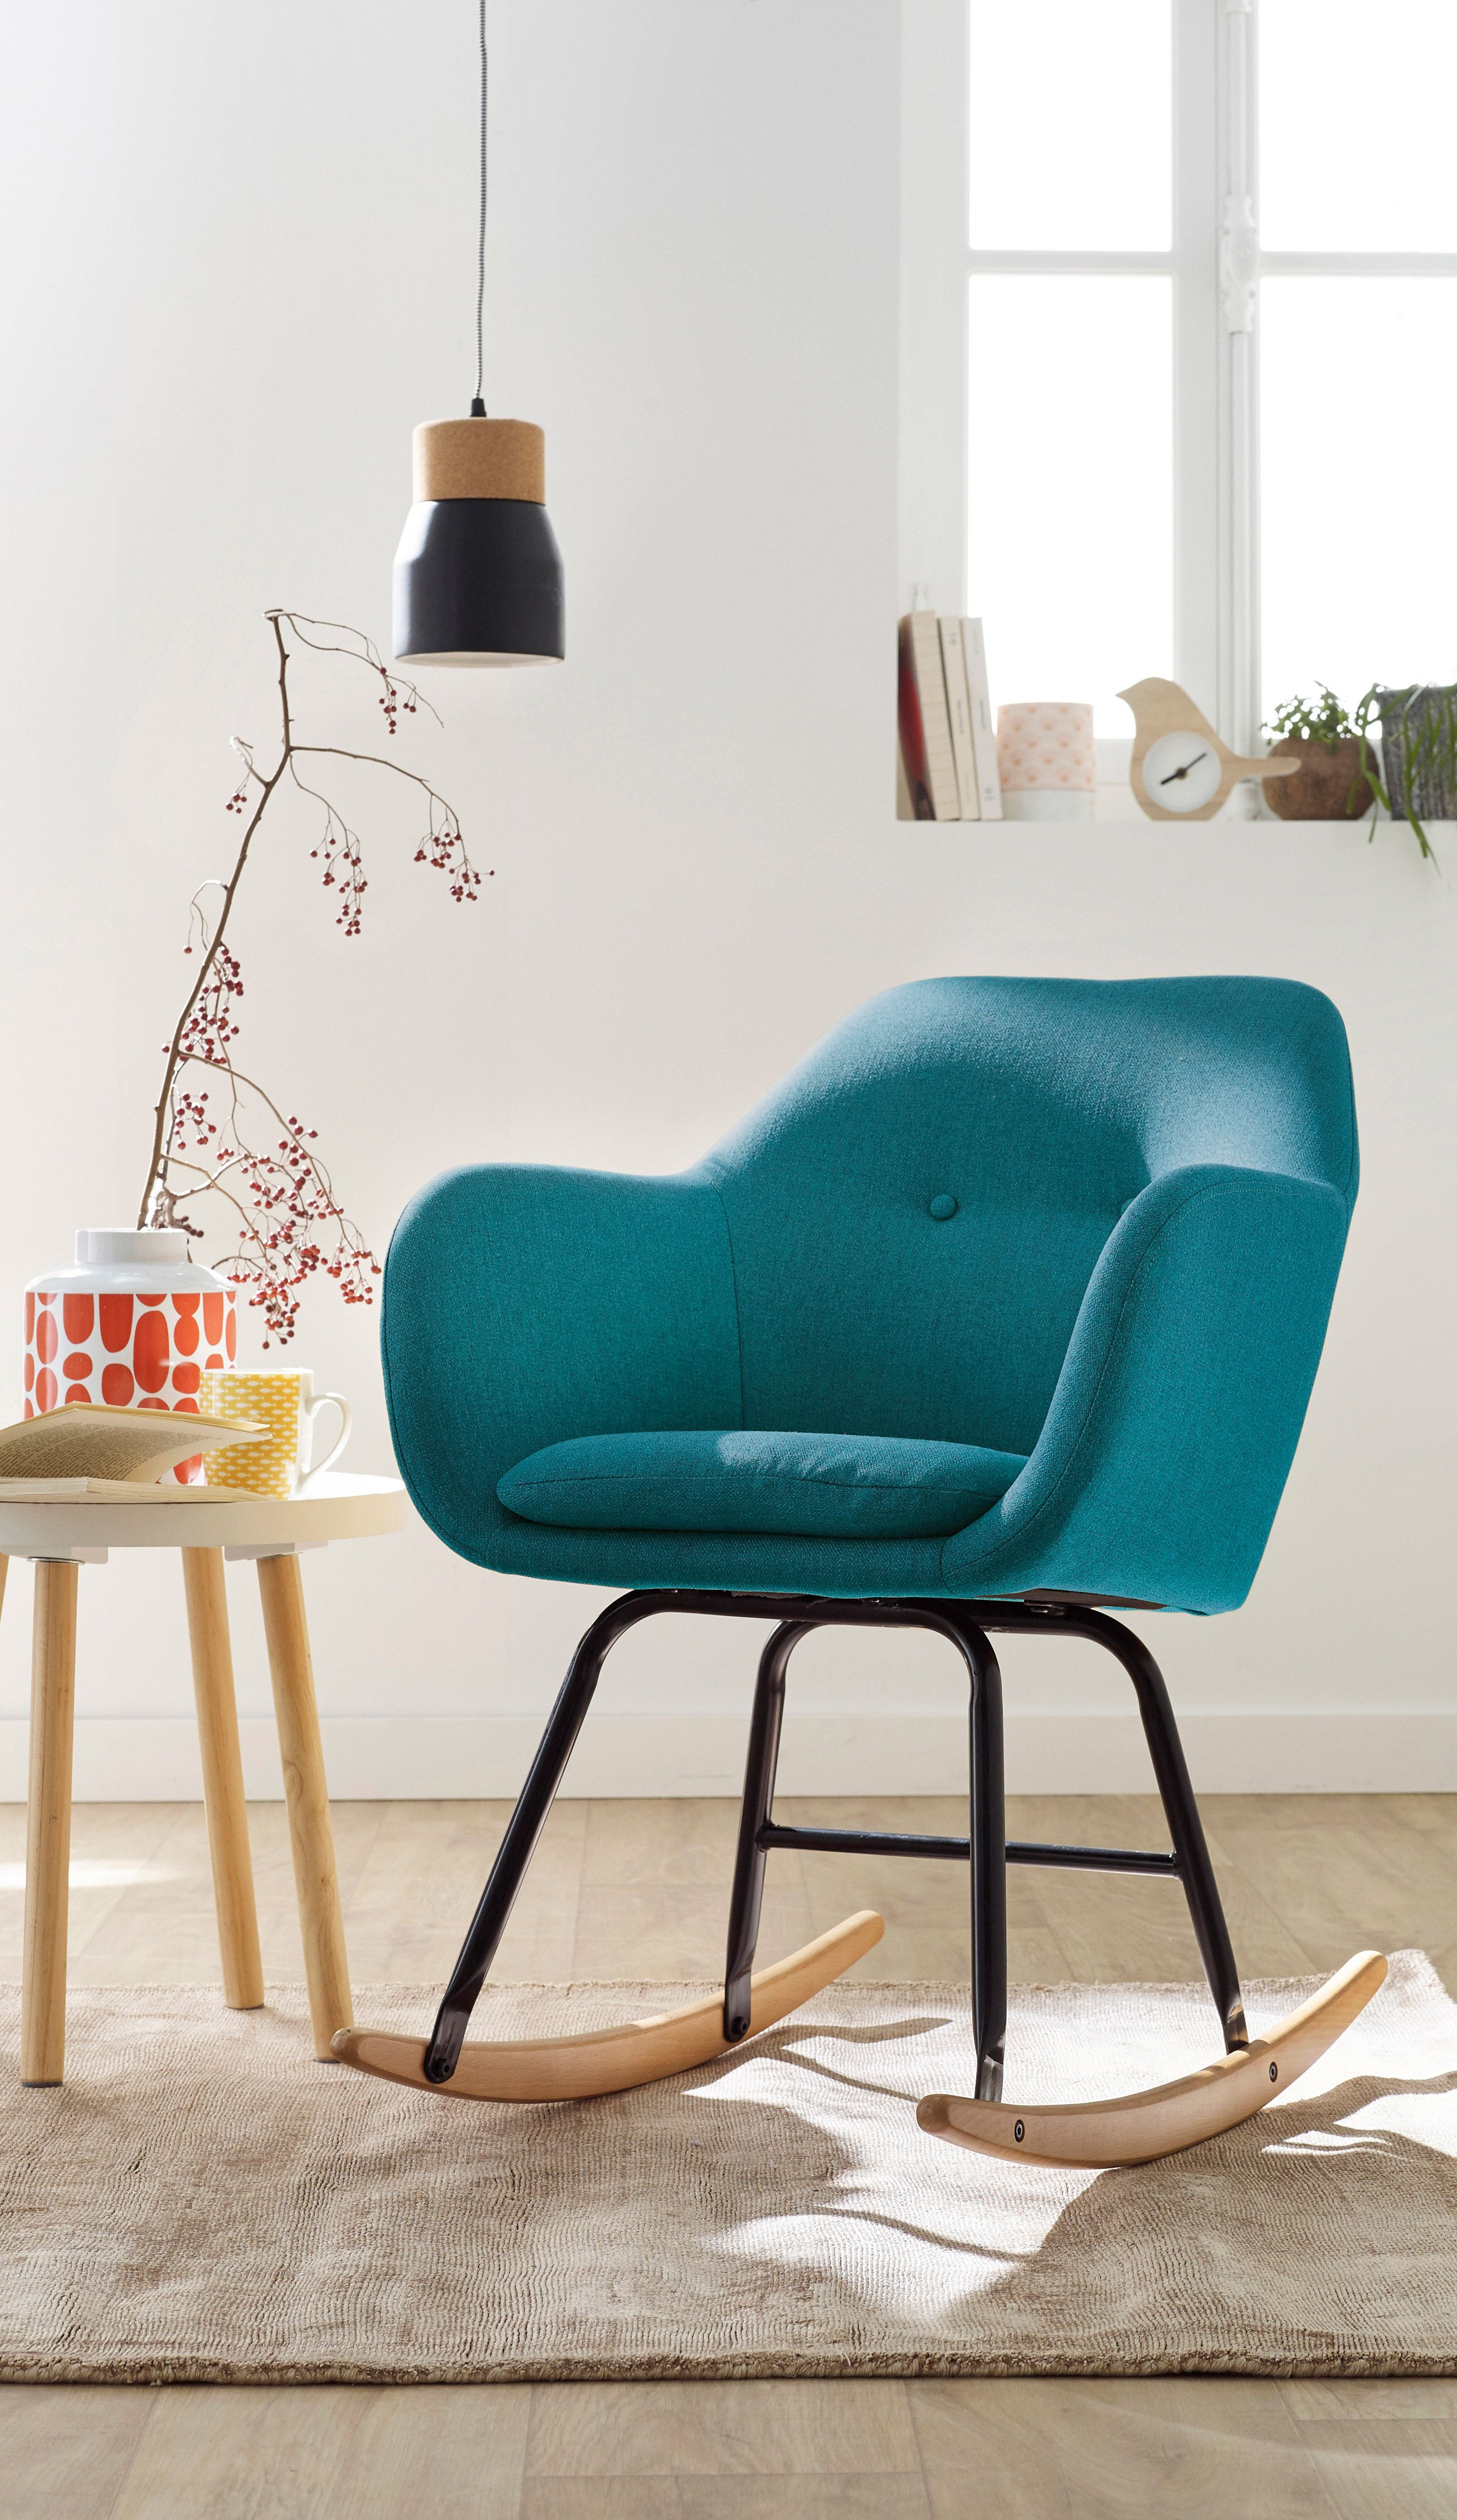 emilia salon fauteuil bascule en tissu bleu p trole alin a pi ce de vie s salon en. Black Bedroom Furniture Sets. Home Design Ideas